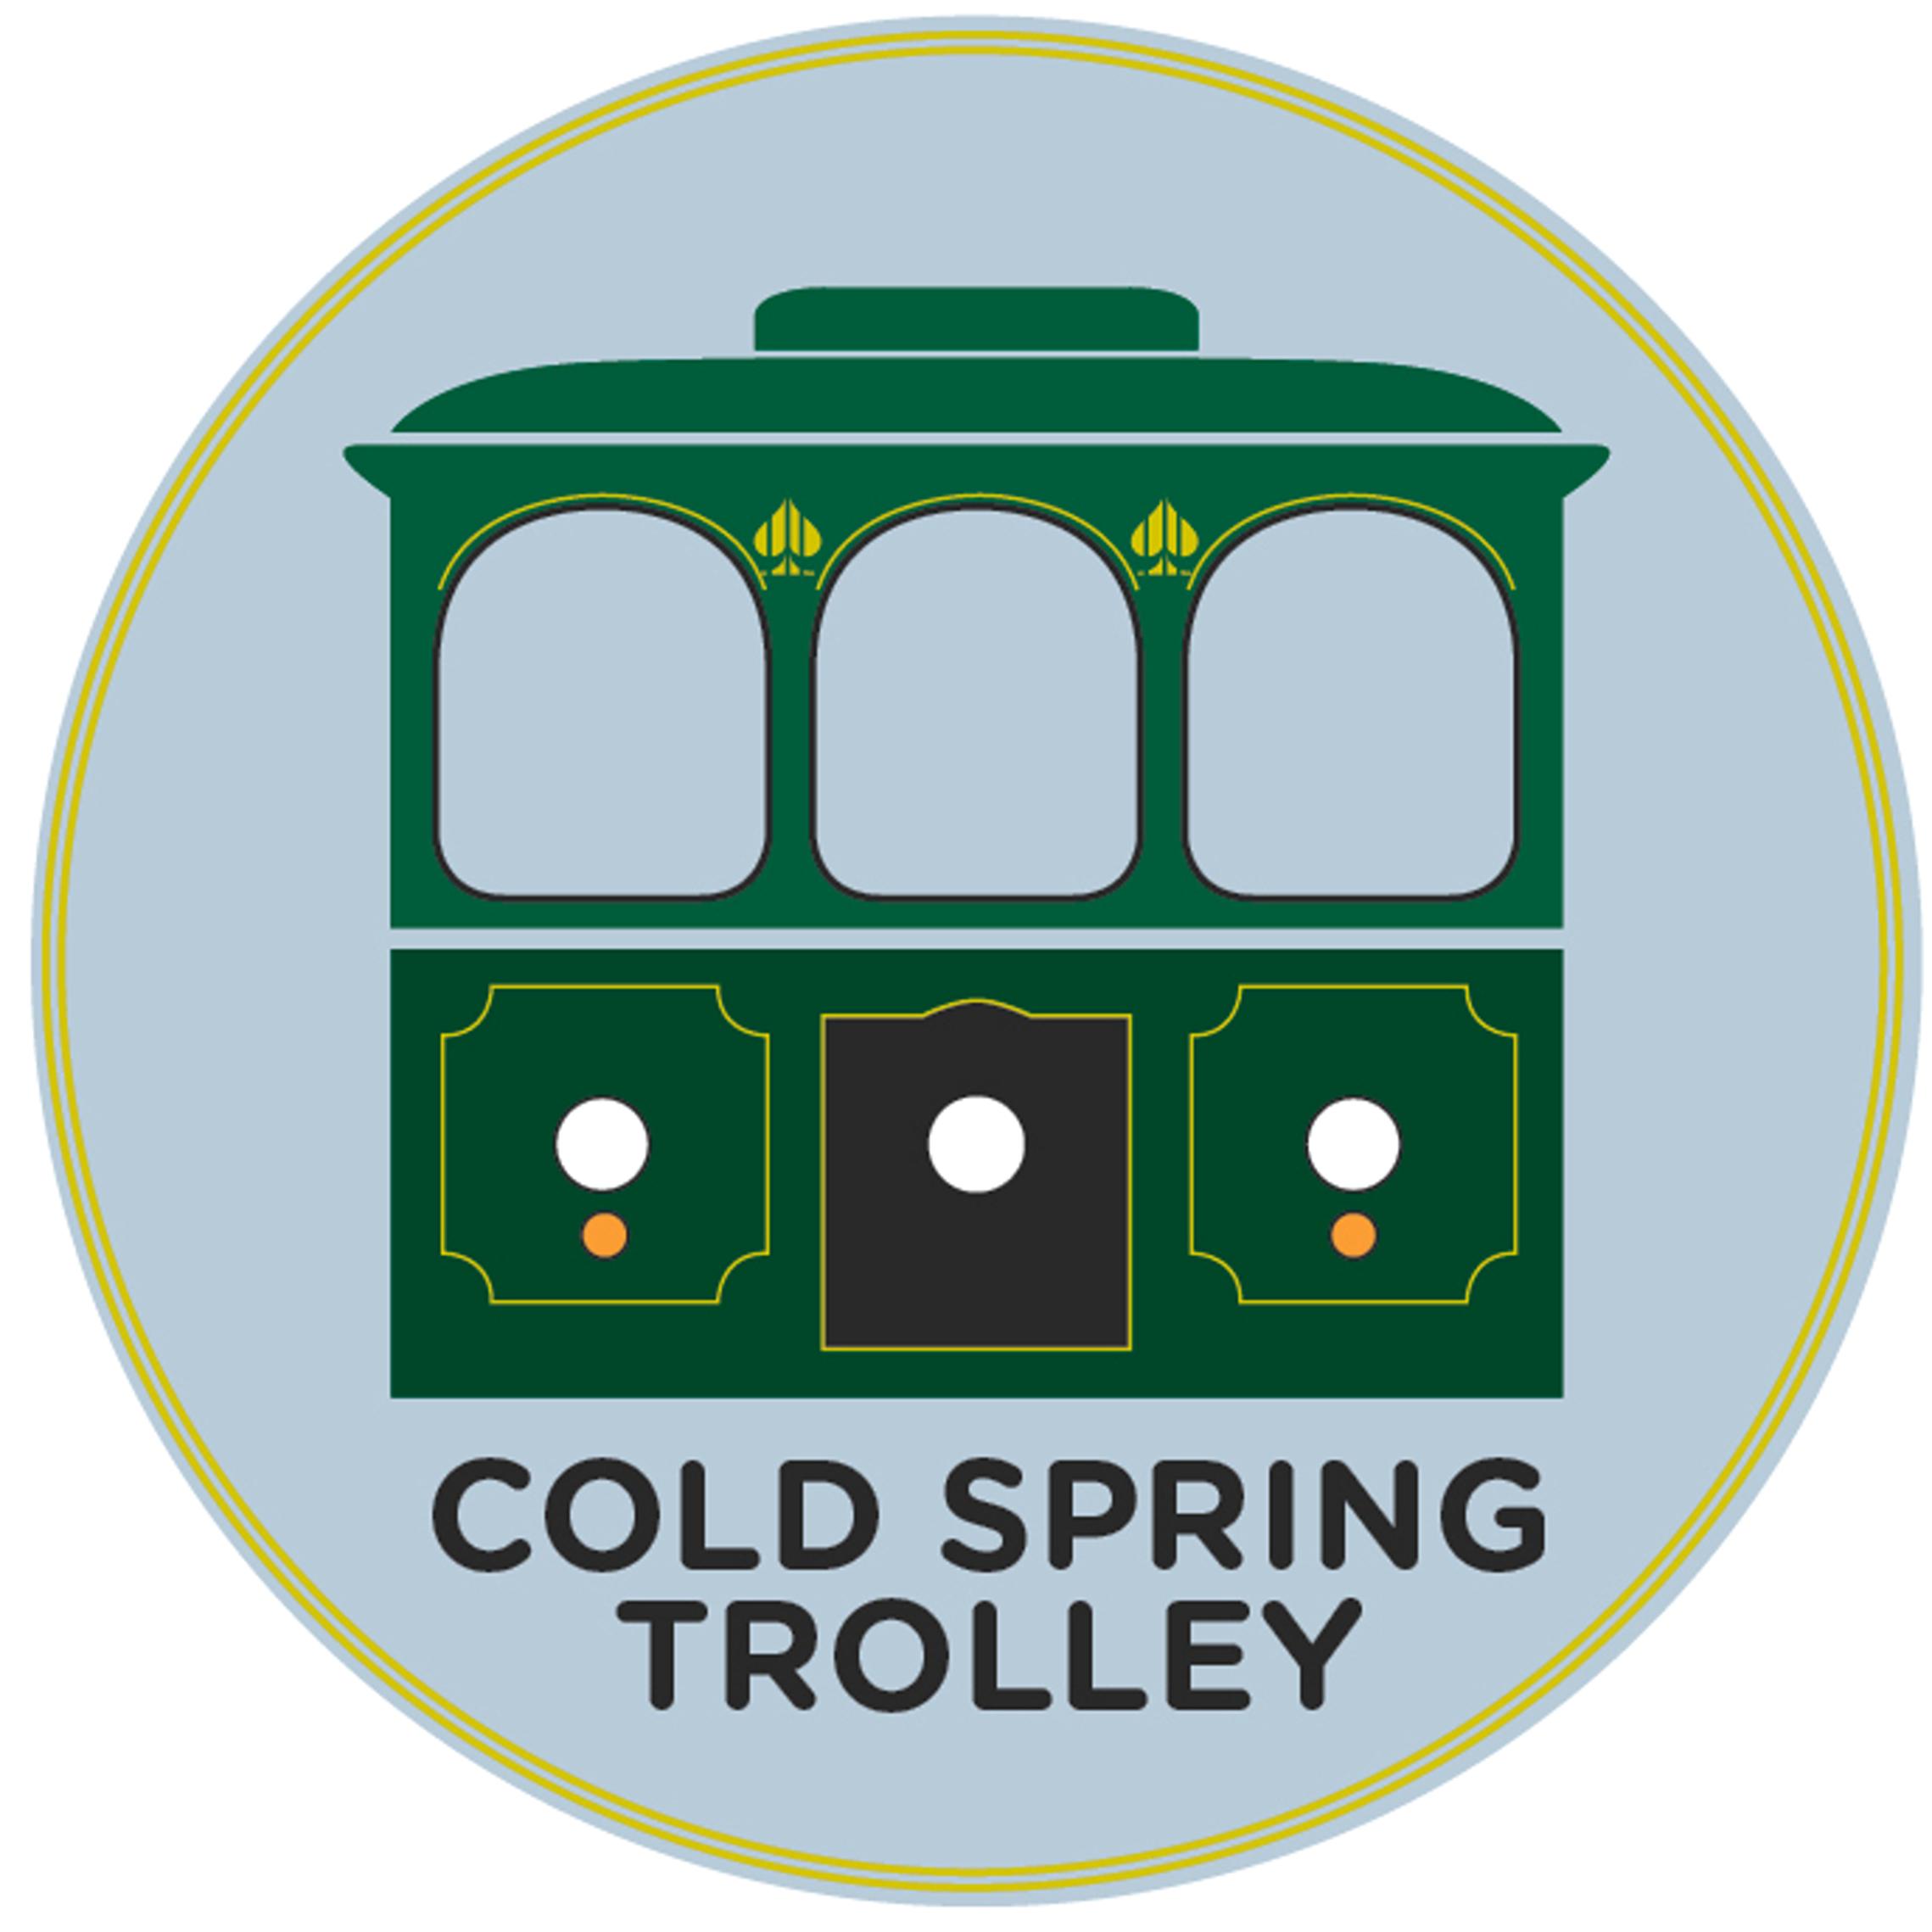 Cold Spring trolley logo (2).jpg